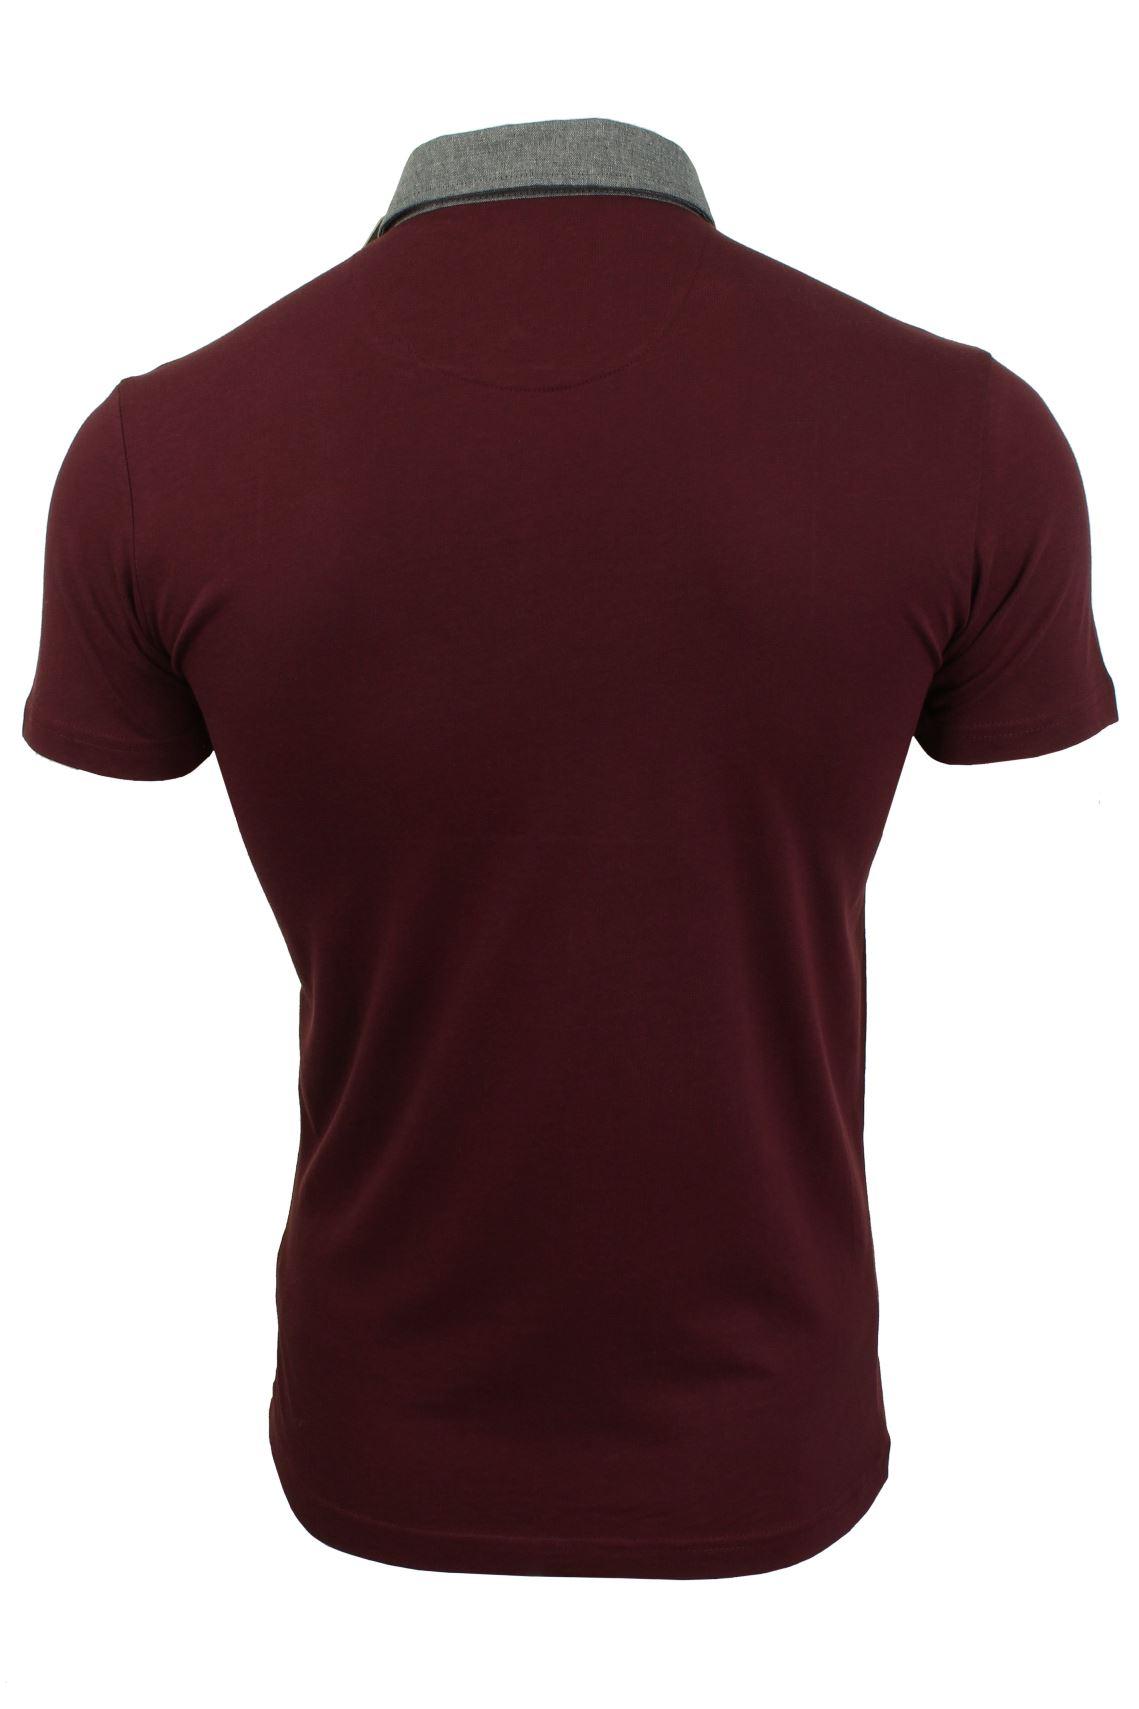 Mens-Polo-T-Shirt-Chimera-Brave-Soul-Denim-Chambray-Collar-Short-Sleeved-Cotton thumbnail 10